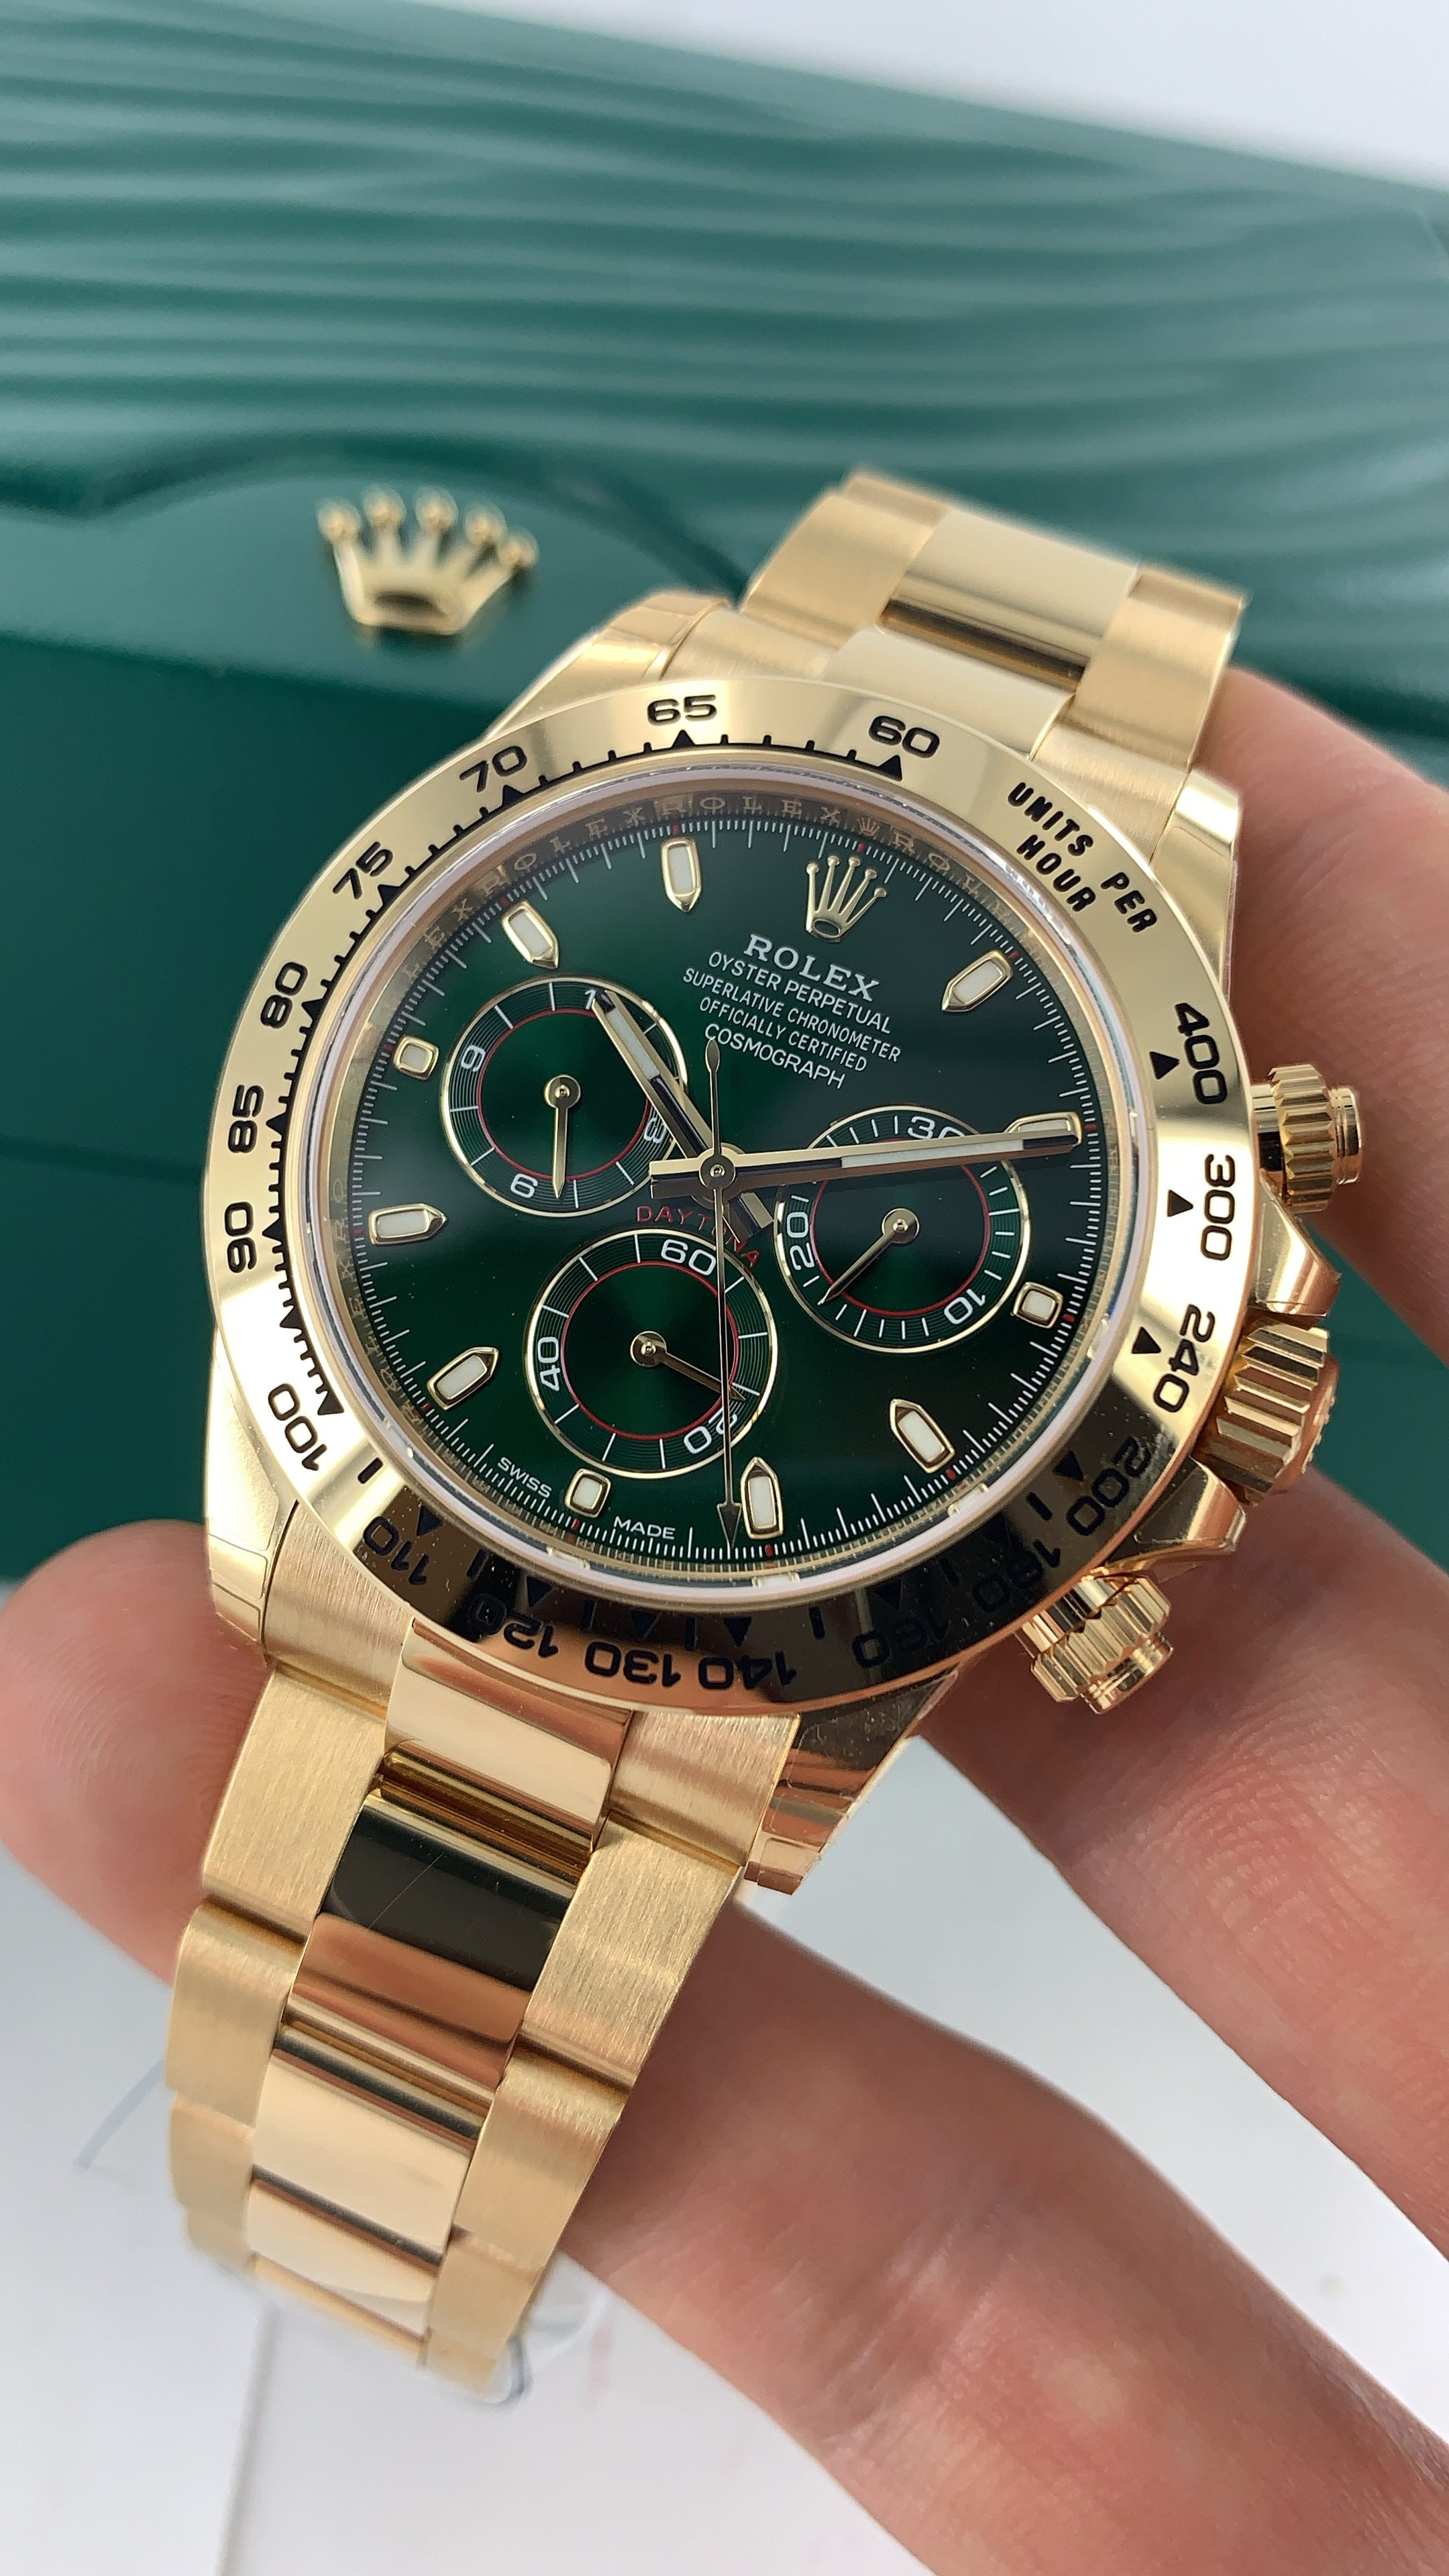 ROLEX DAYTONA YELLOW GOLD GREEN DIAL 116508 - Carr Watches